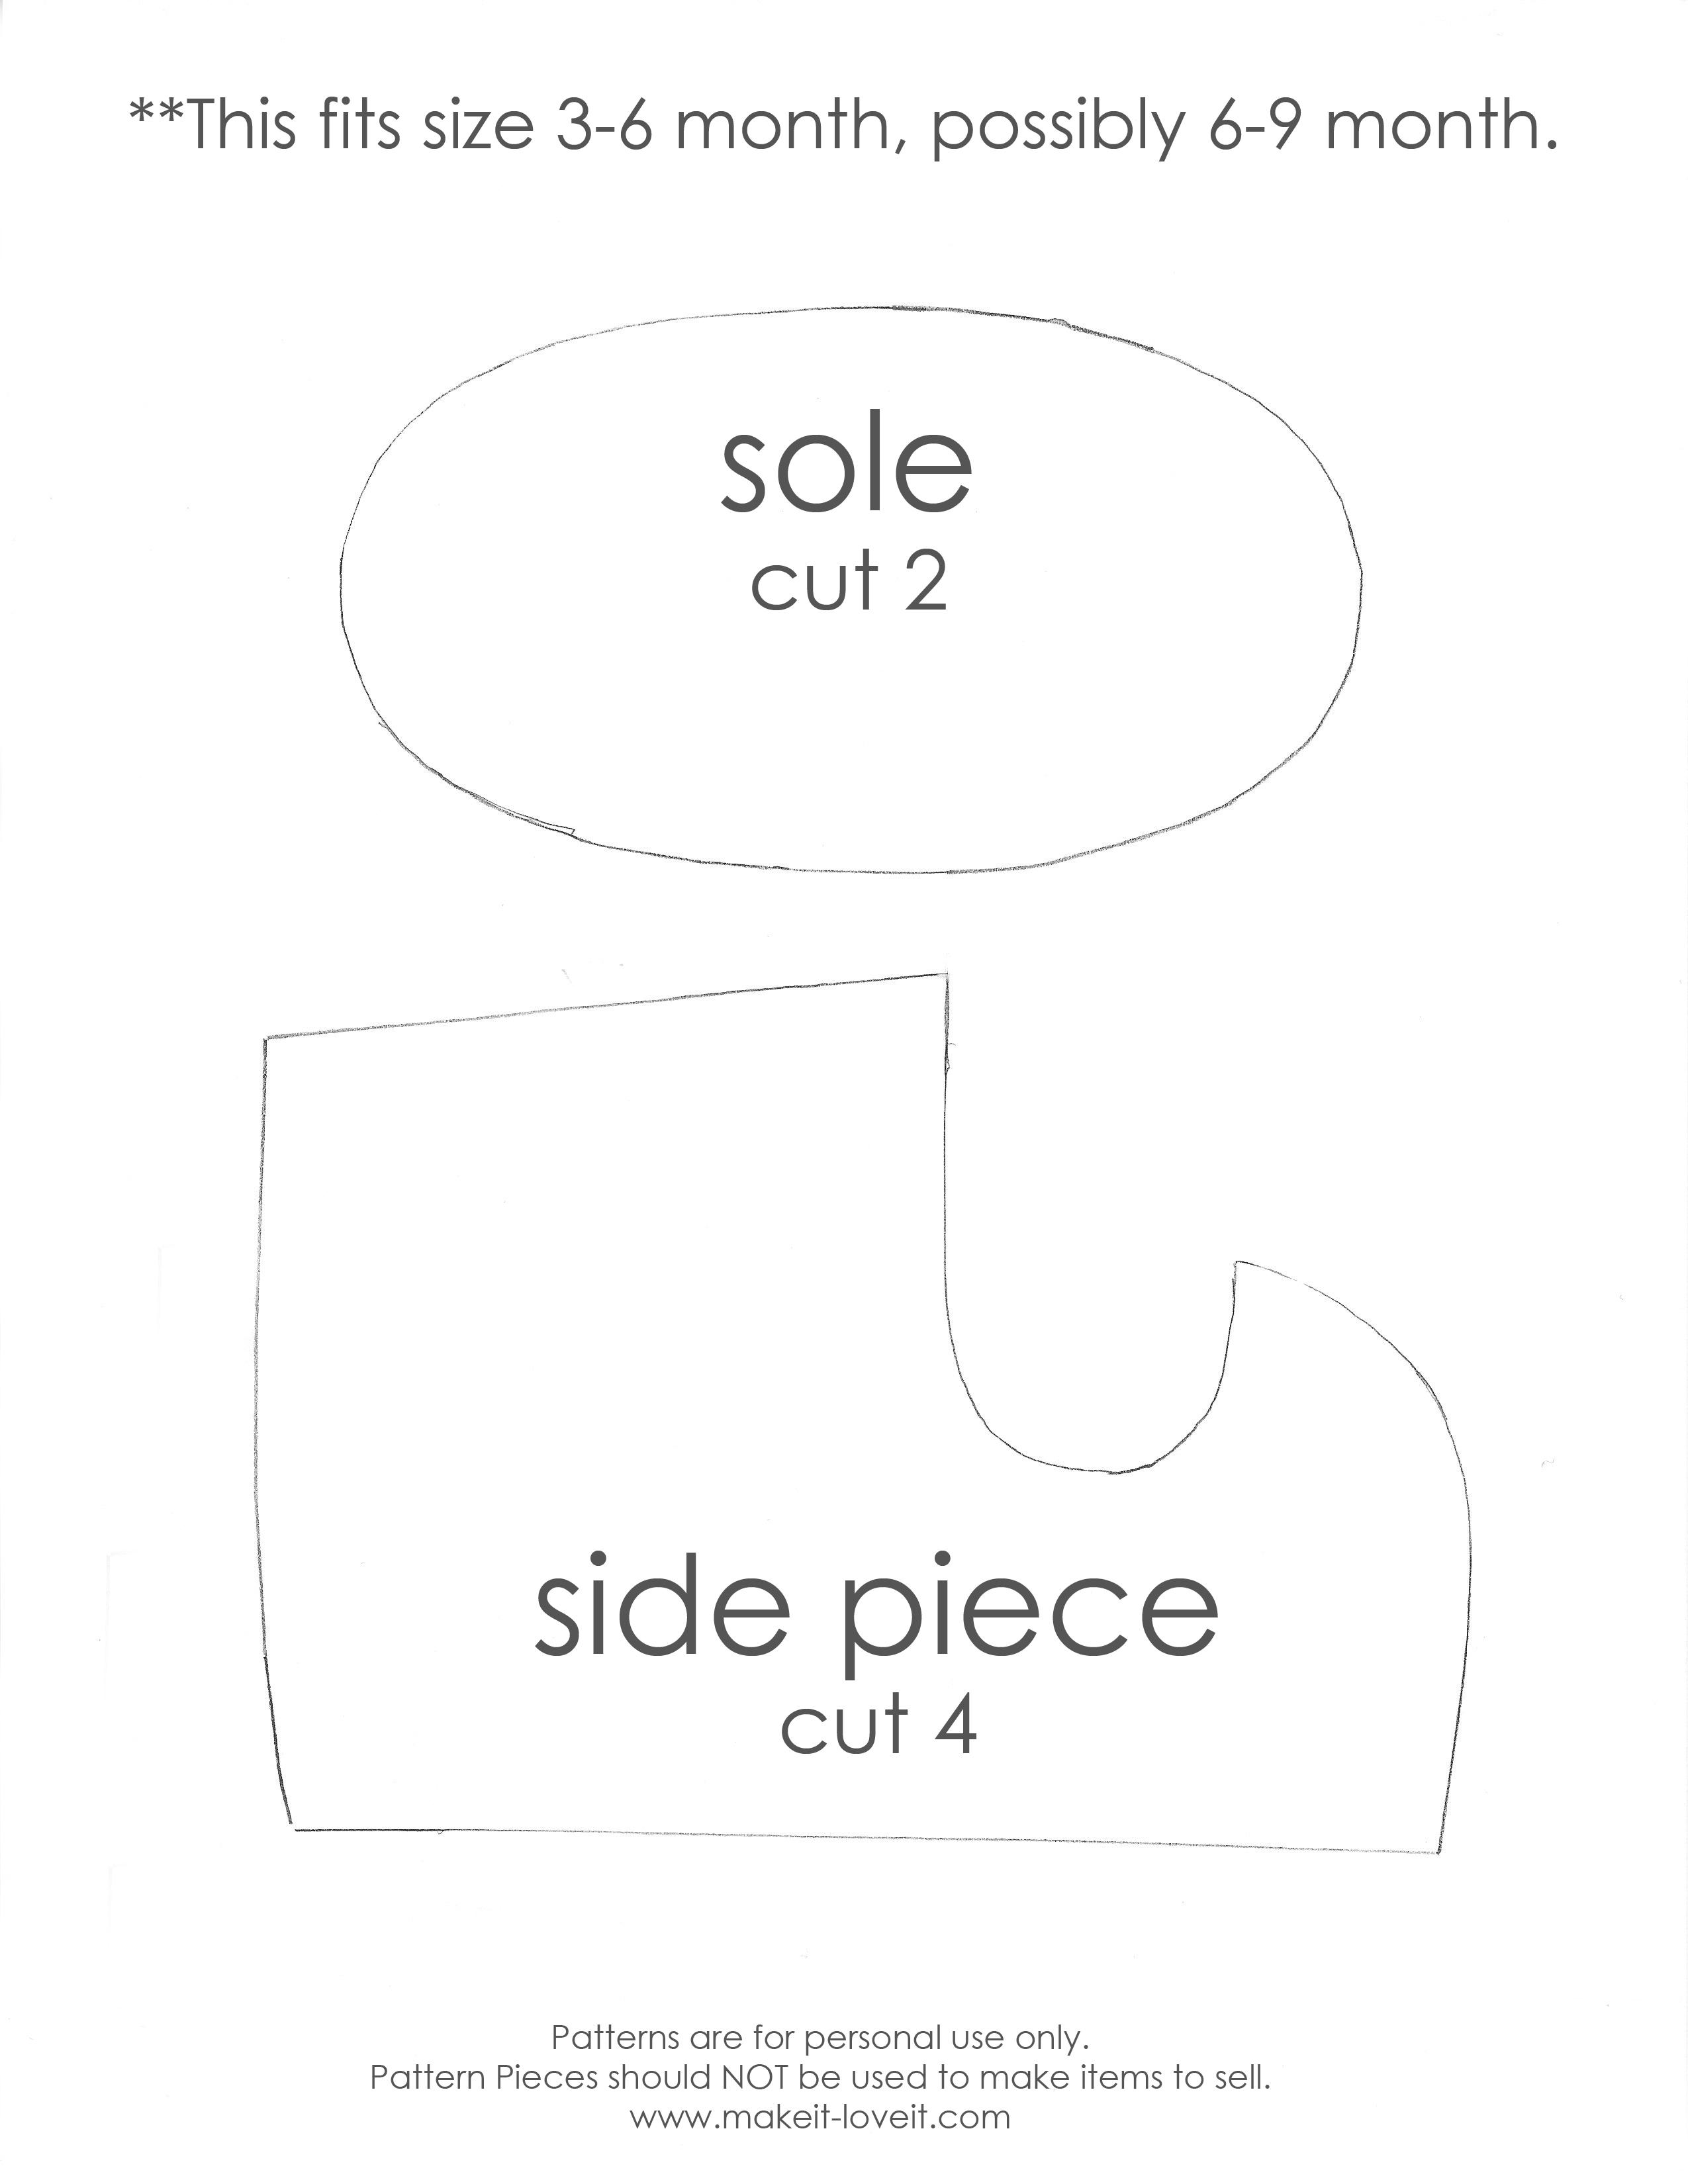 munchkin shoe pattern pieces